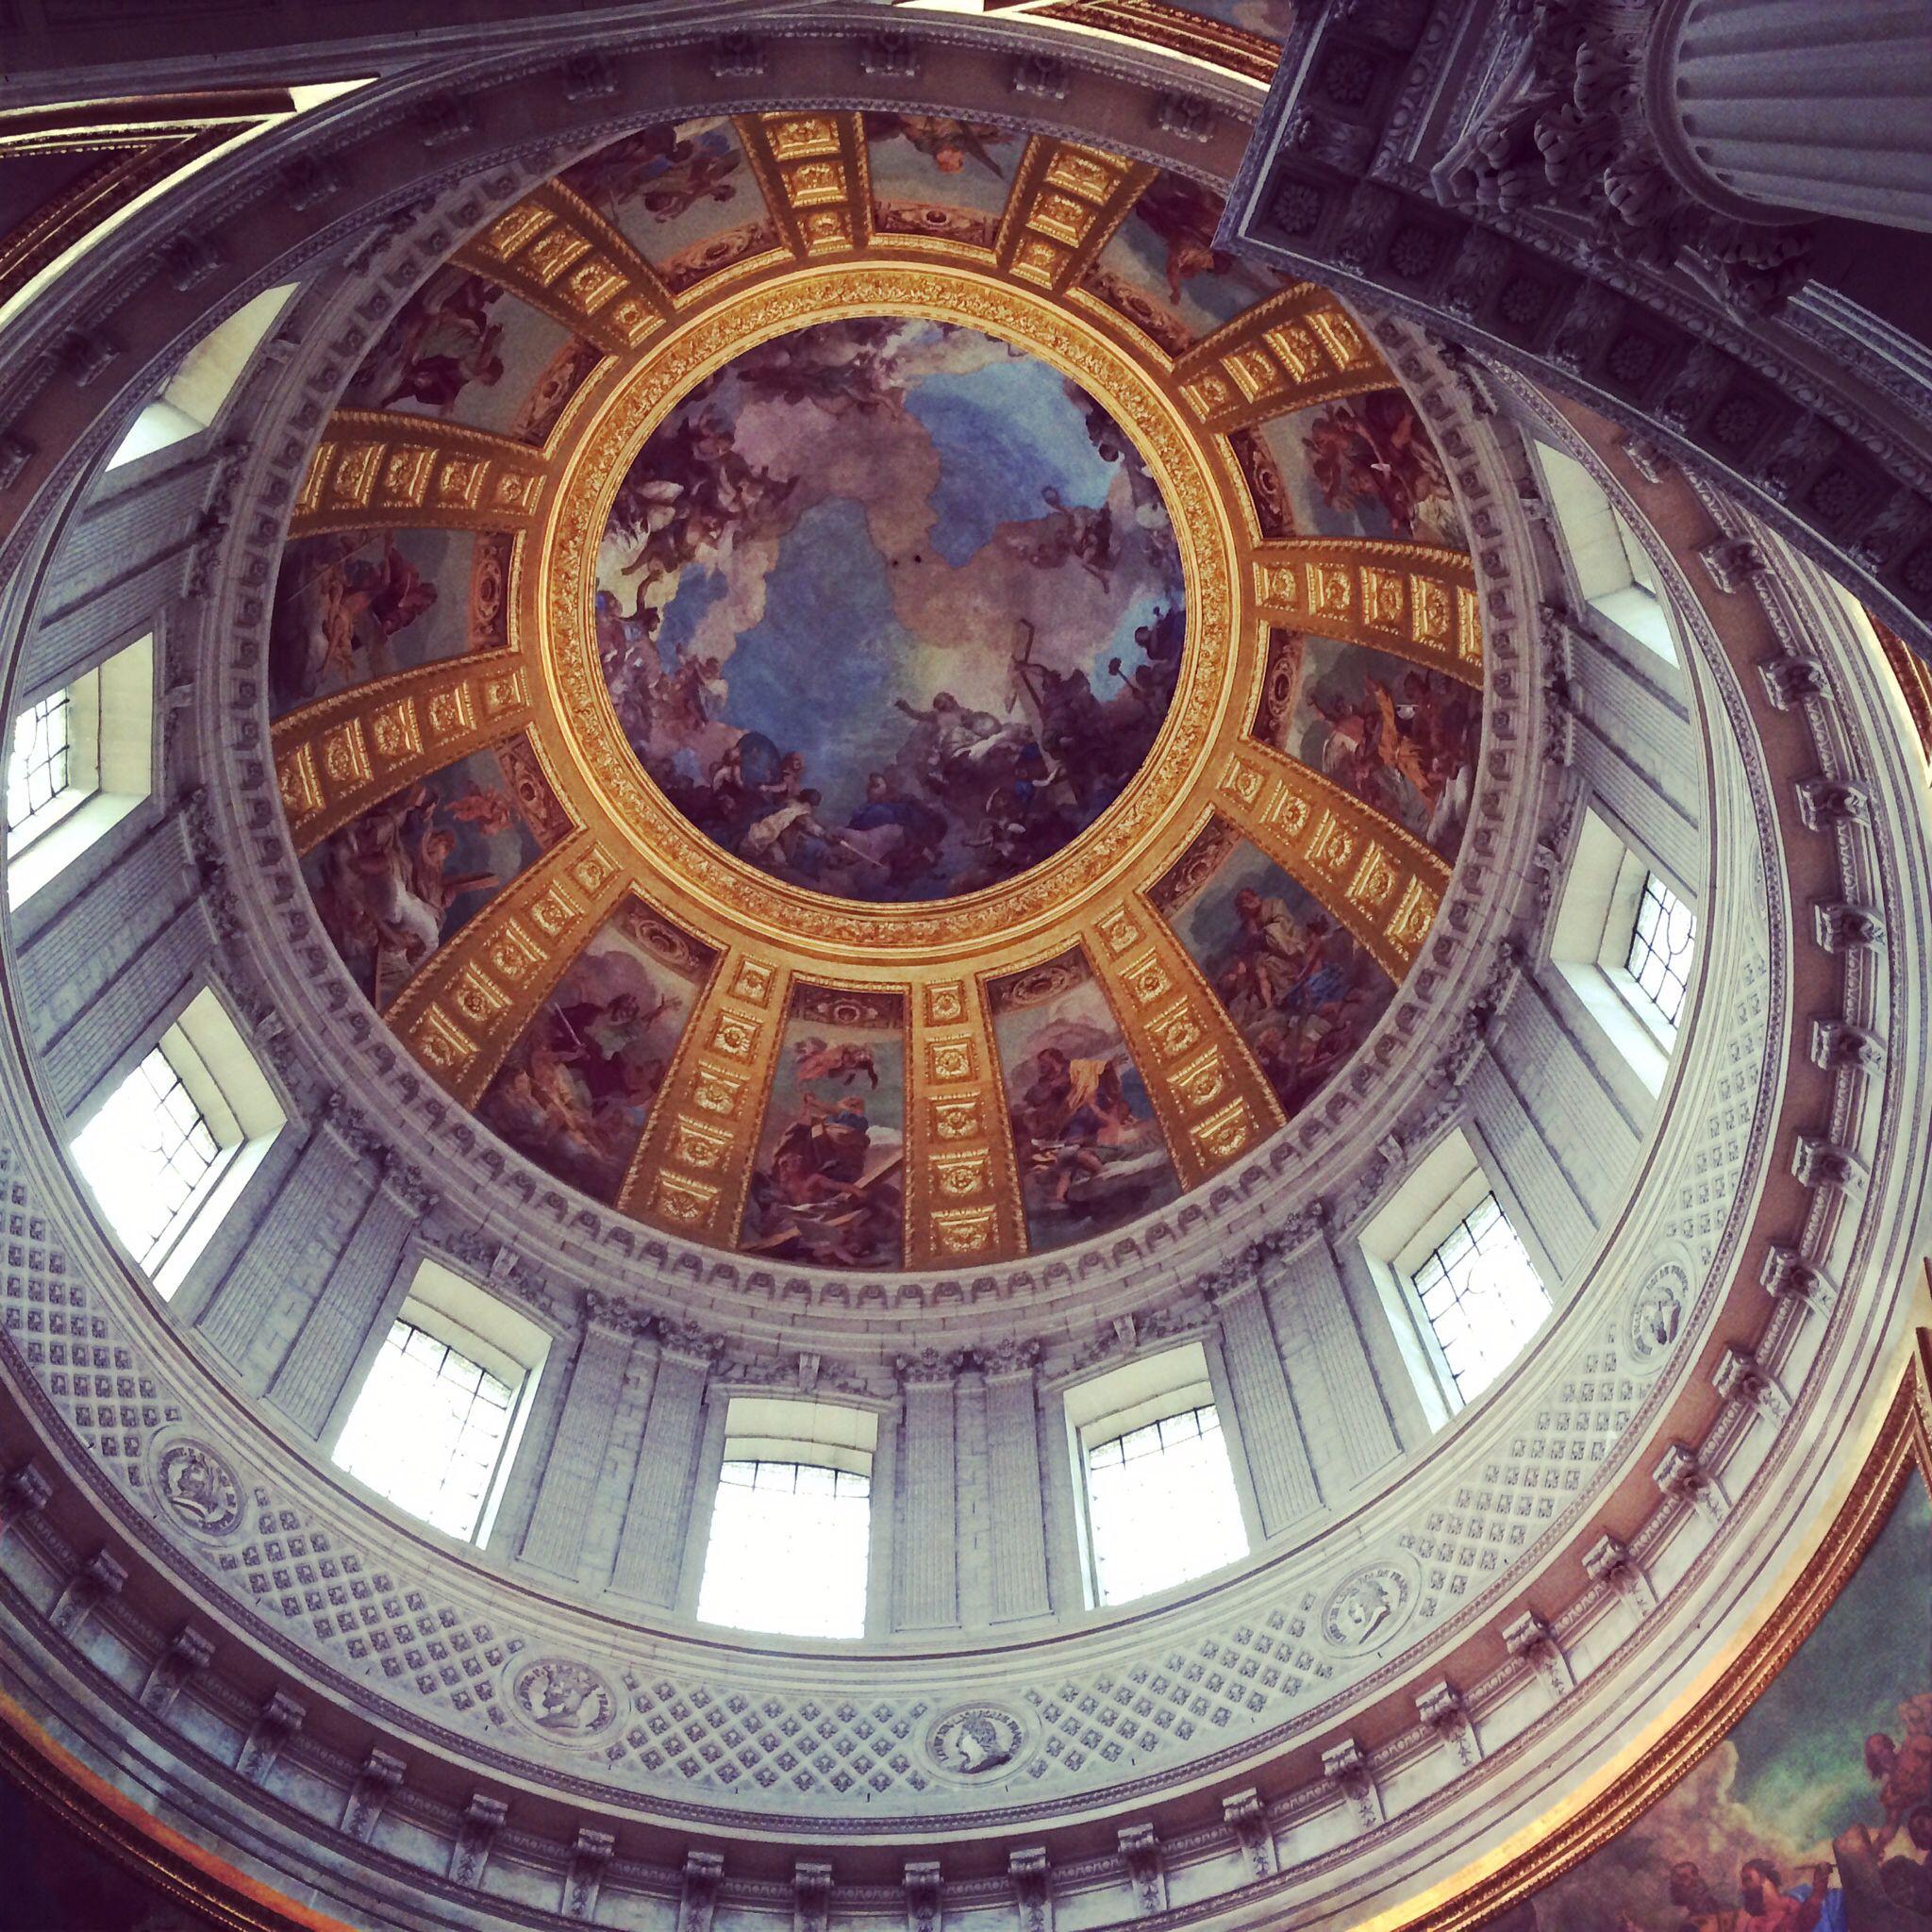 Napoleon's Tomb, interior shot of the dome